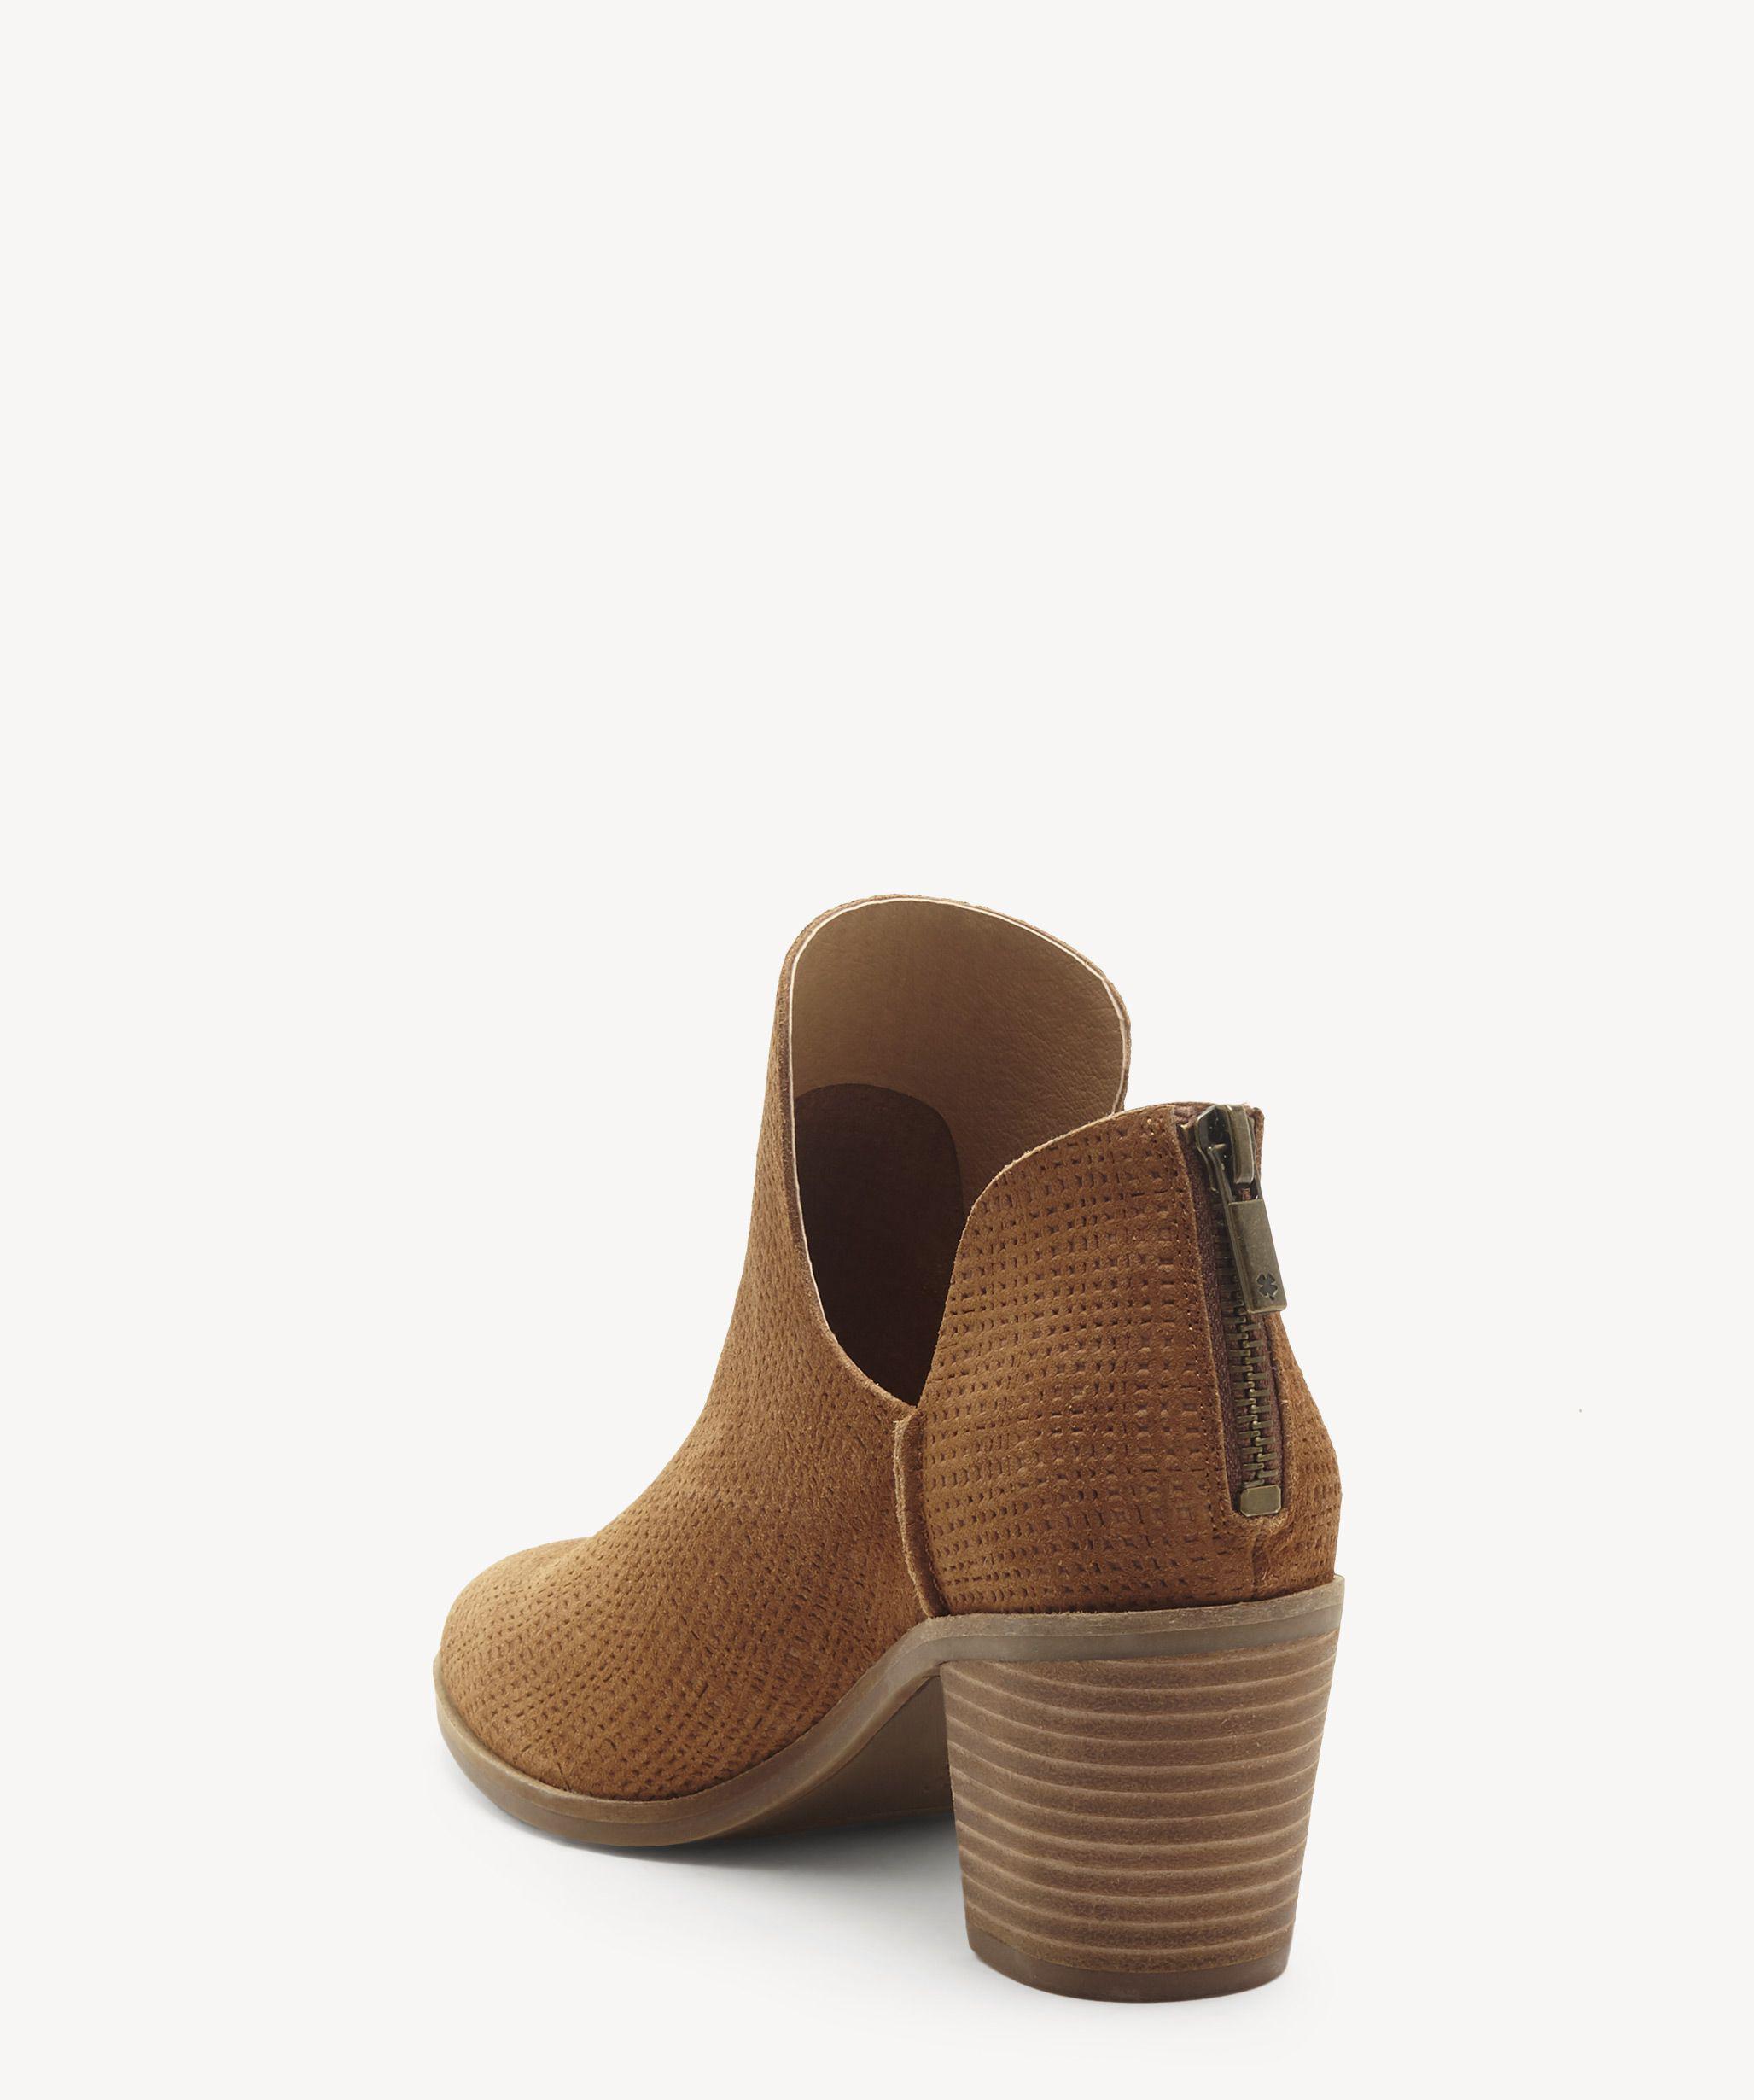 Lucky Brand Women/'s Powe Raisin Suede Block Heel Leather Cut Out Side Bootie